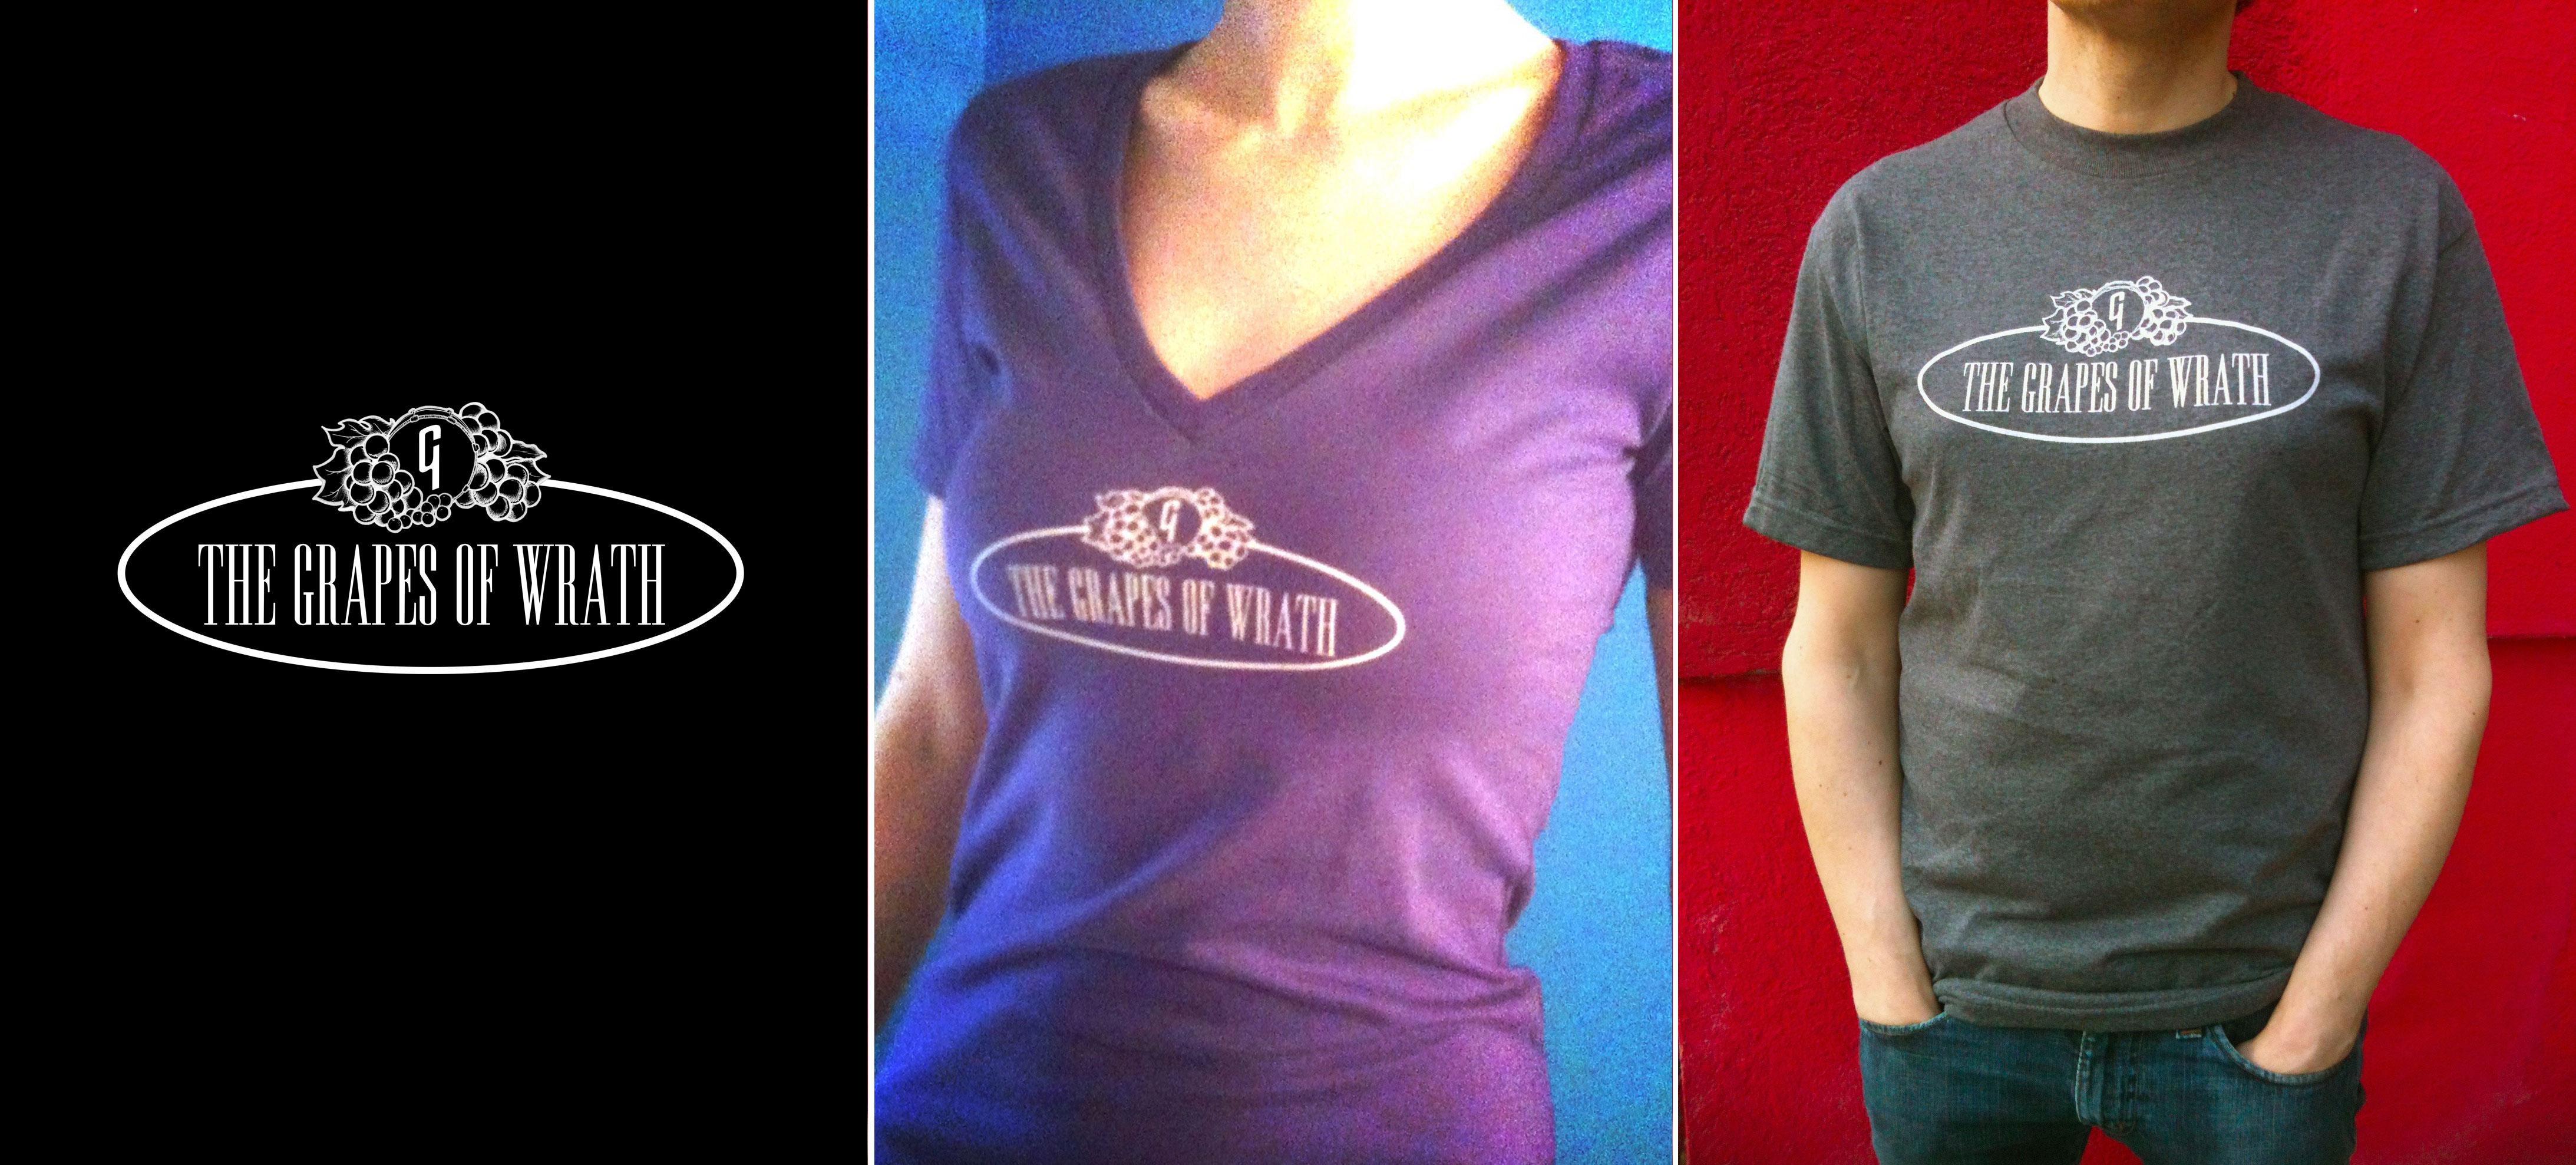 gow-fotl-shirts-04_14